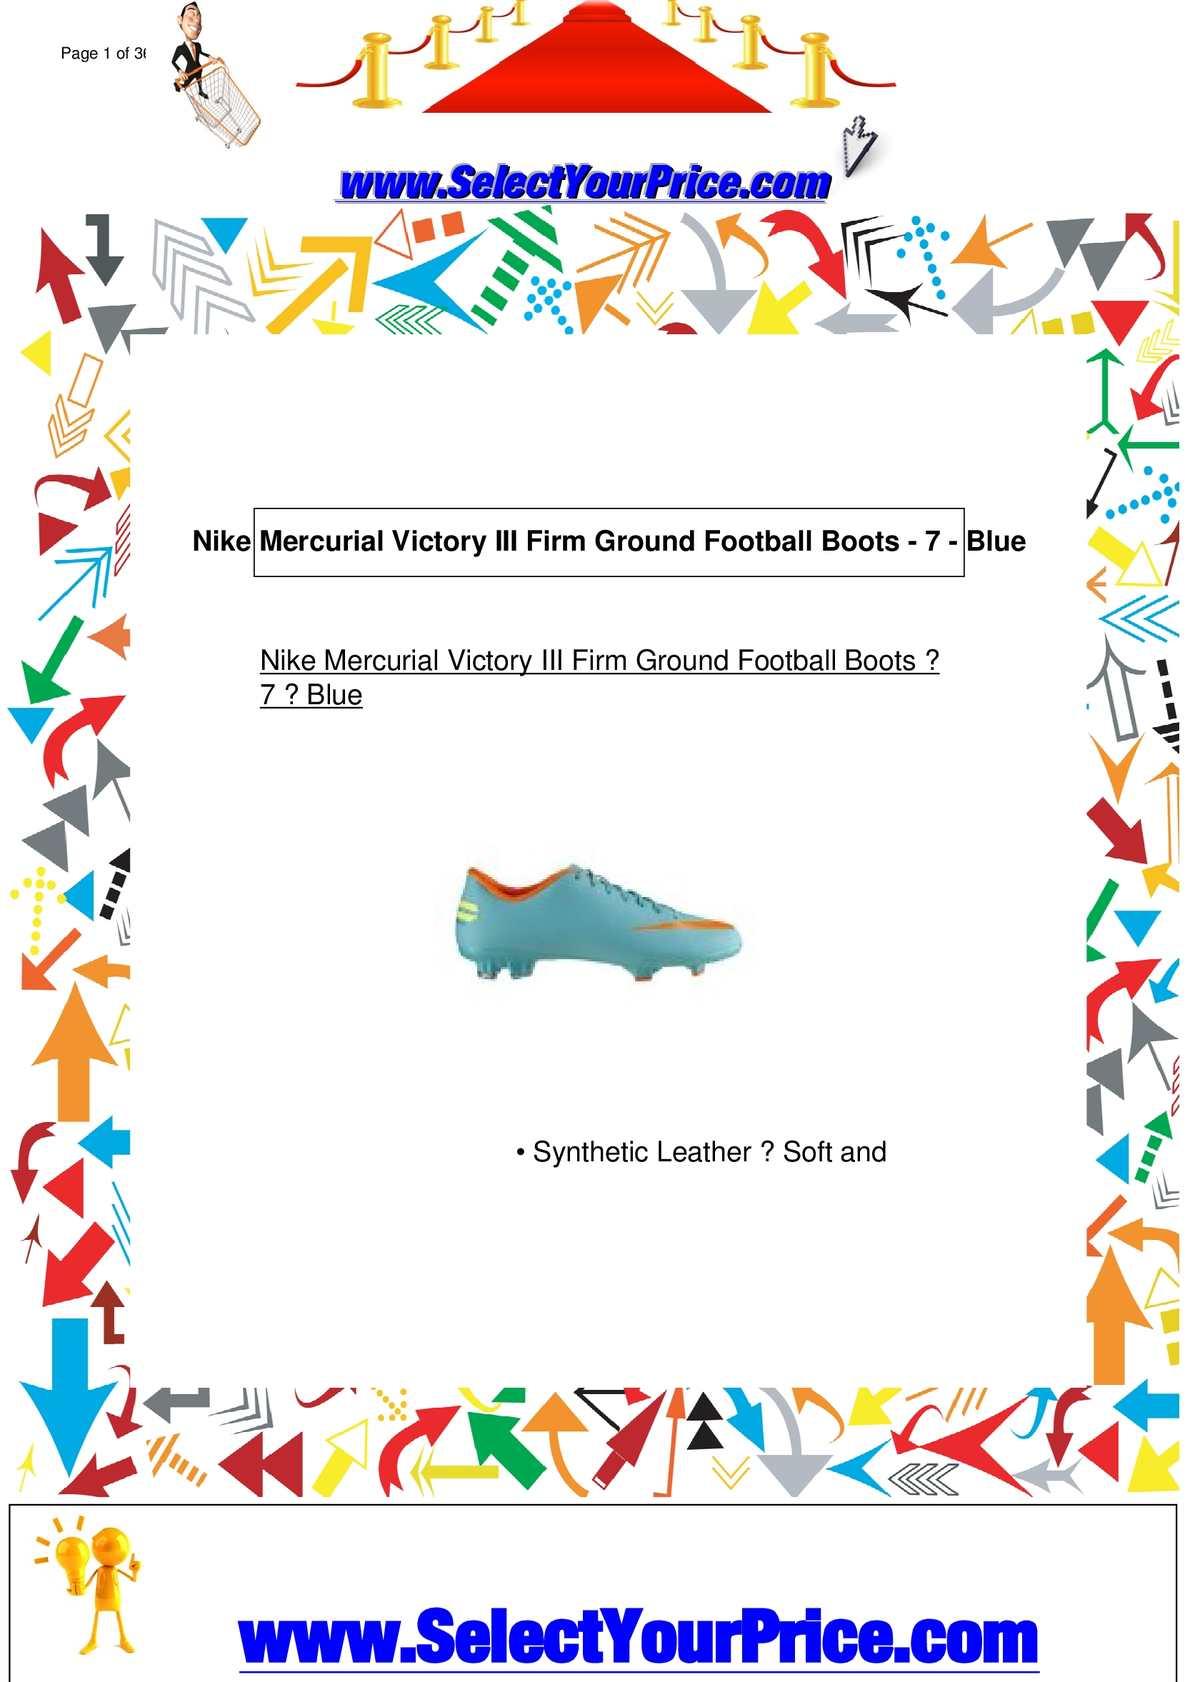 Calaméo - Nike-Mercurial-Victory-Iii-Firm-Ground-Football-Boots-7-Blue c7cb0cae6